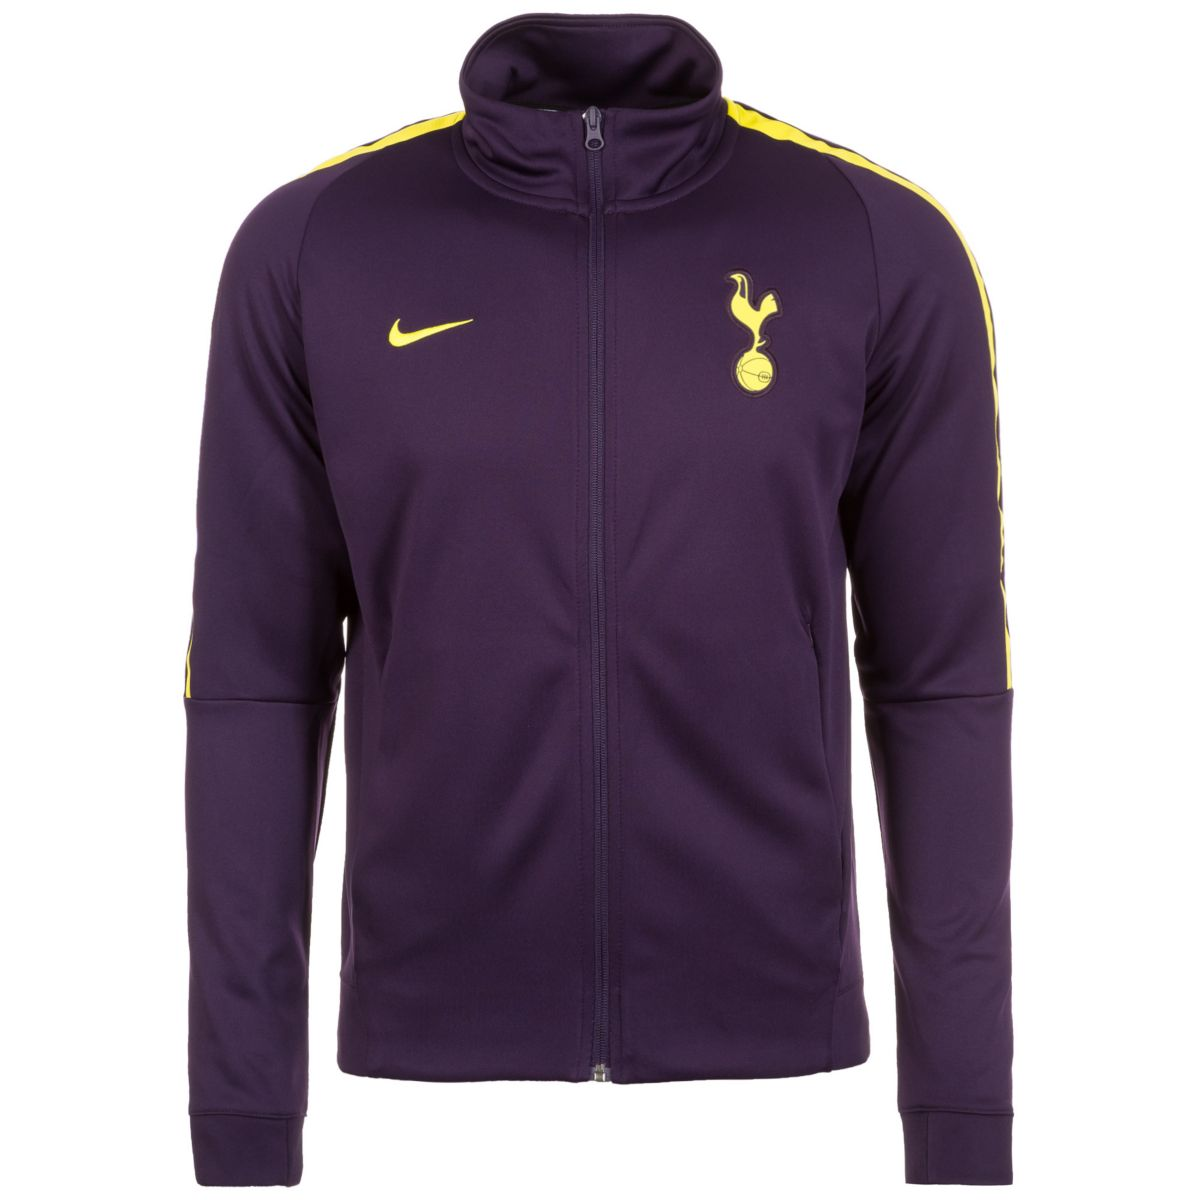 Nike Trainingsjacke »Tottenham Hotspur Franchise«